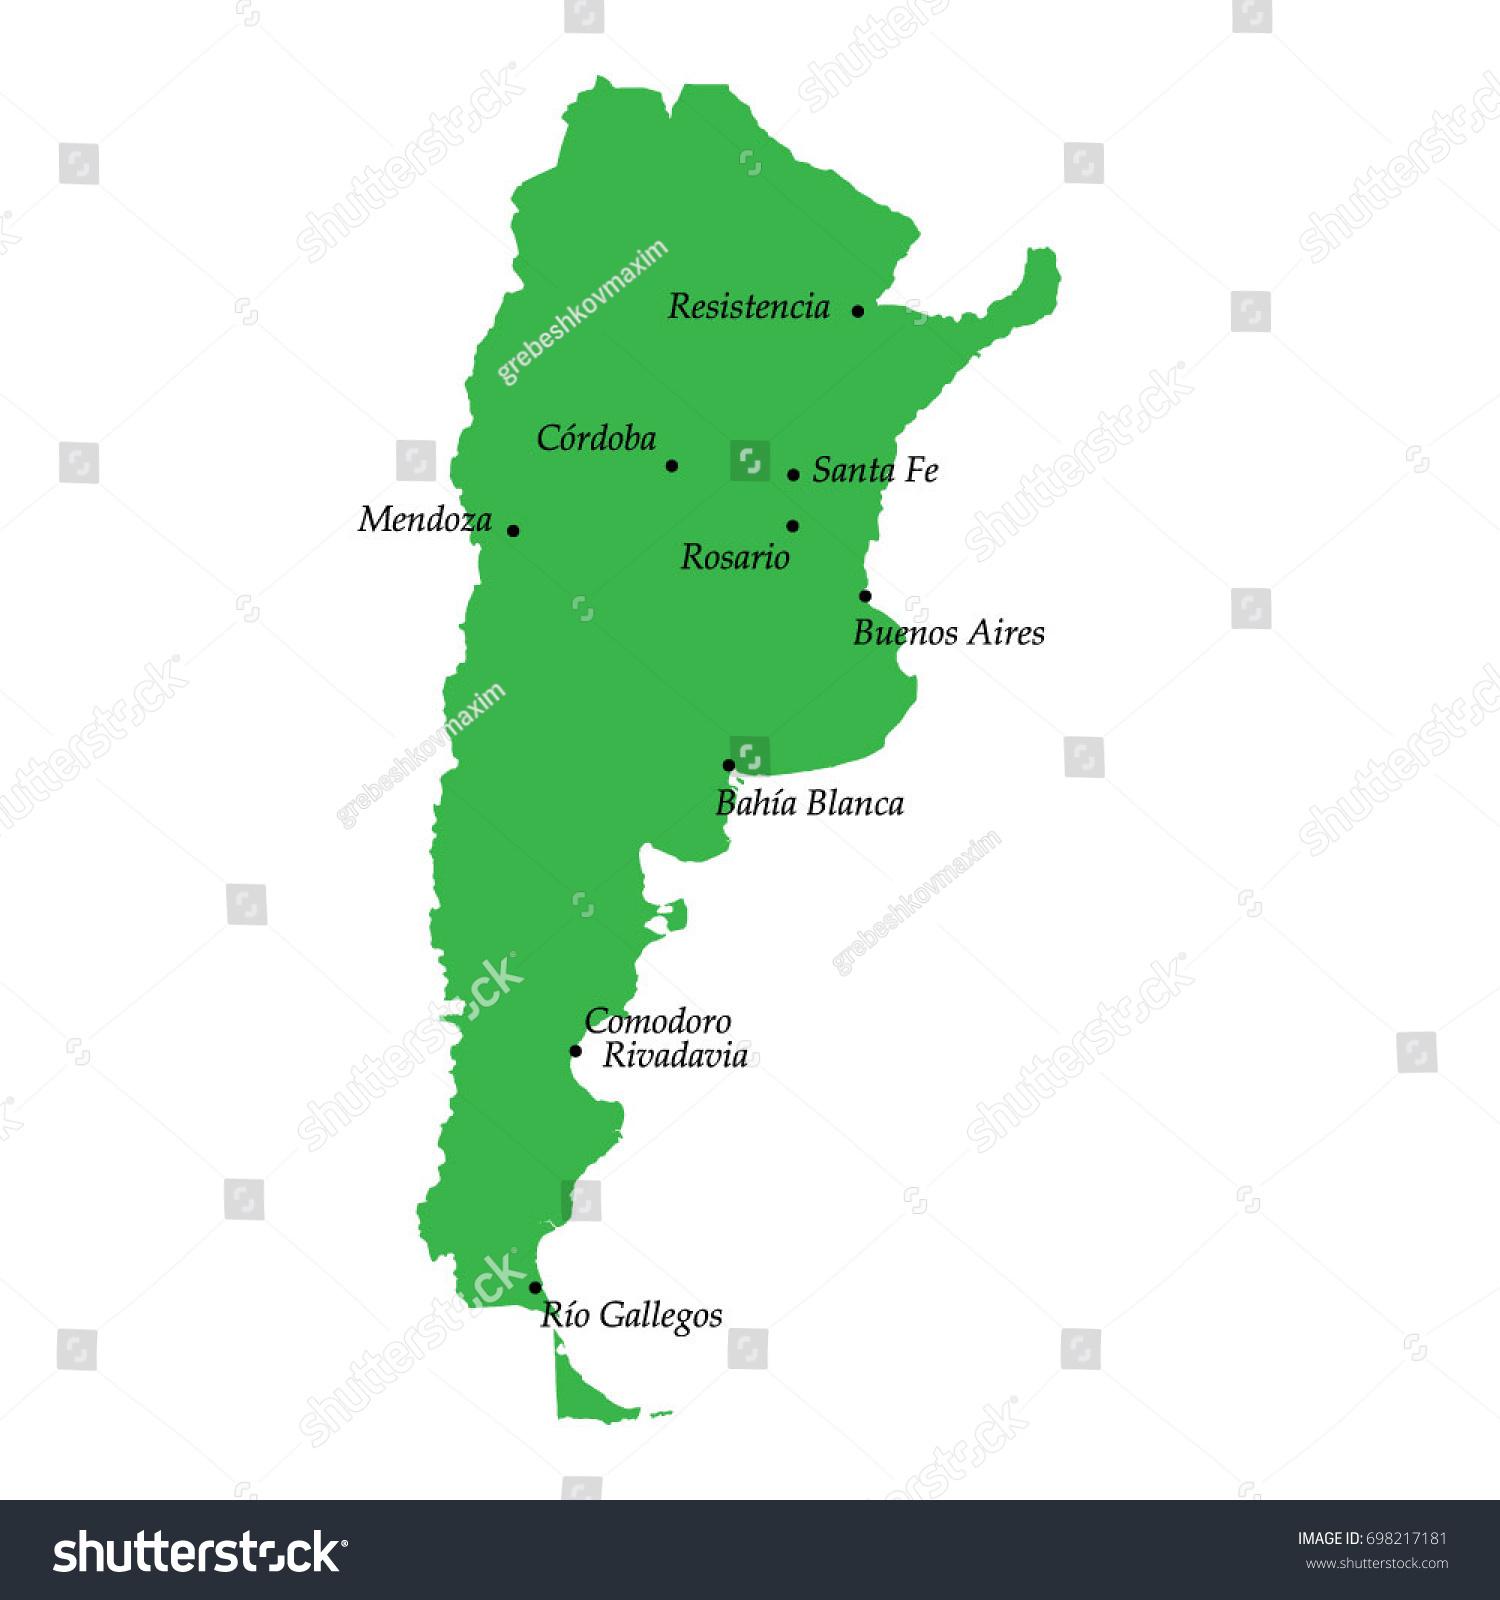 argentina major cities map Map Argentina Main Cities Stock Vector Royalty Free 698217181 argentina major cities map